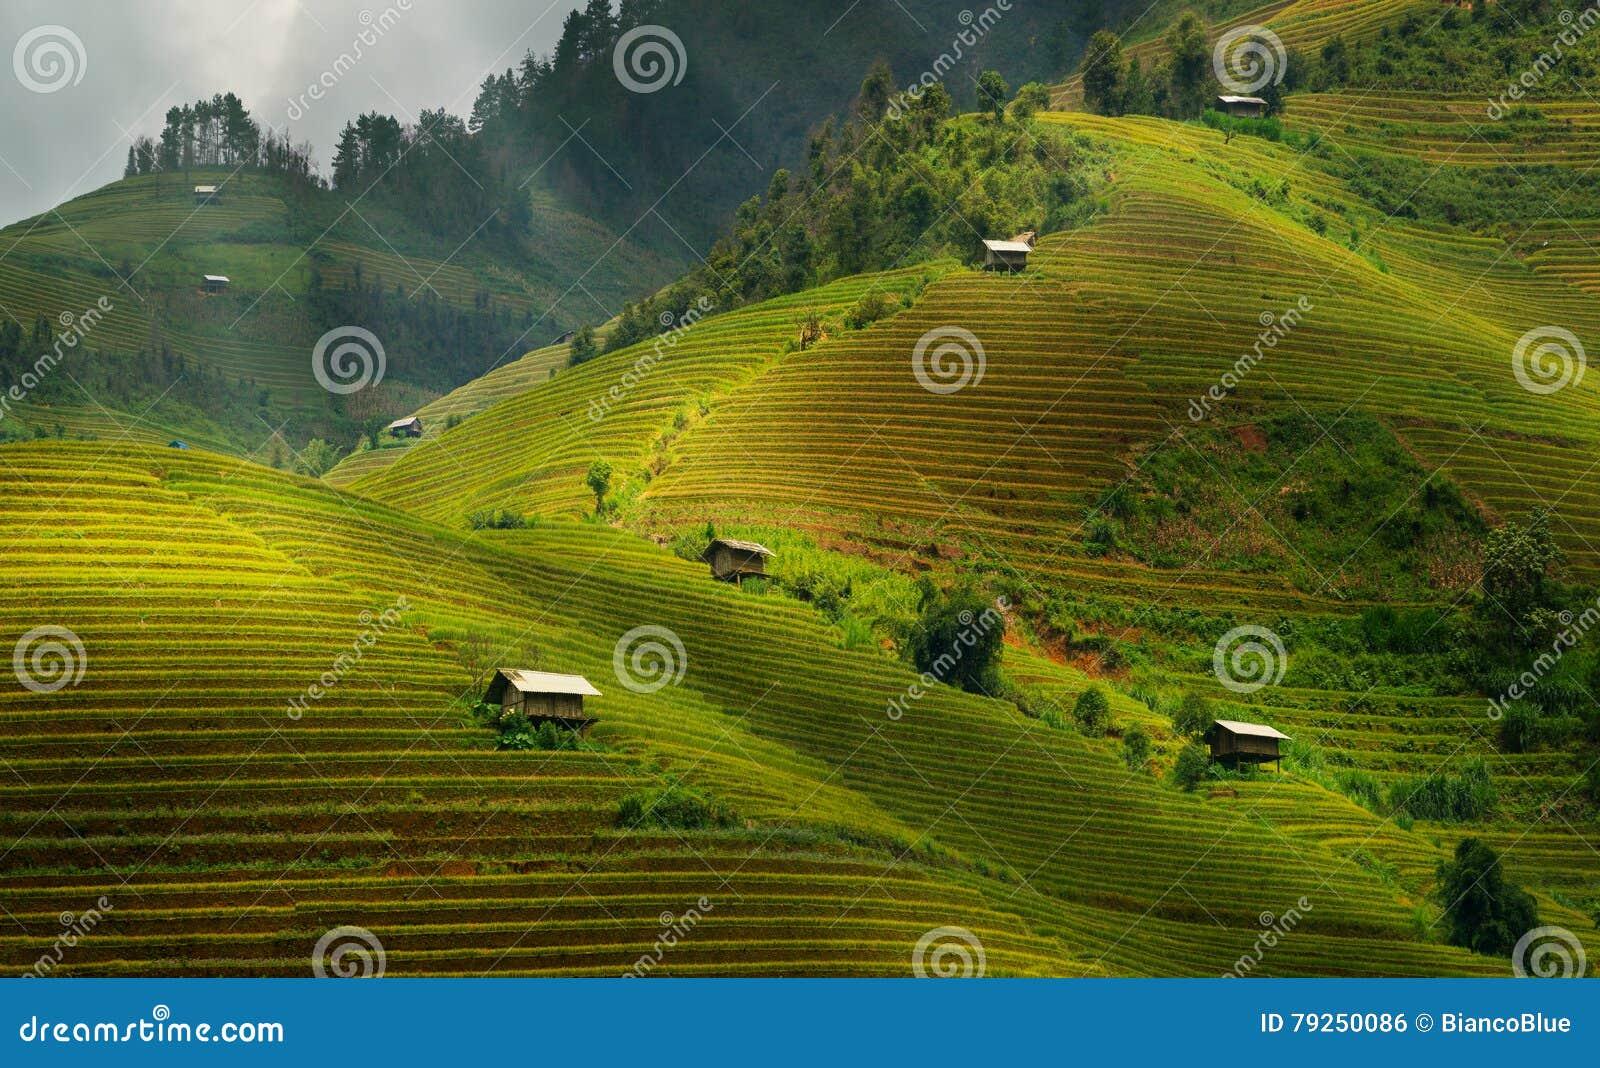 Terassenförmig angelegtes Reisfeld in MU Cang Chai, Vietnam